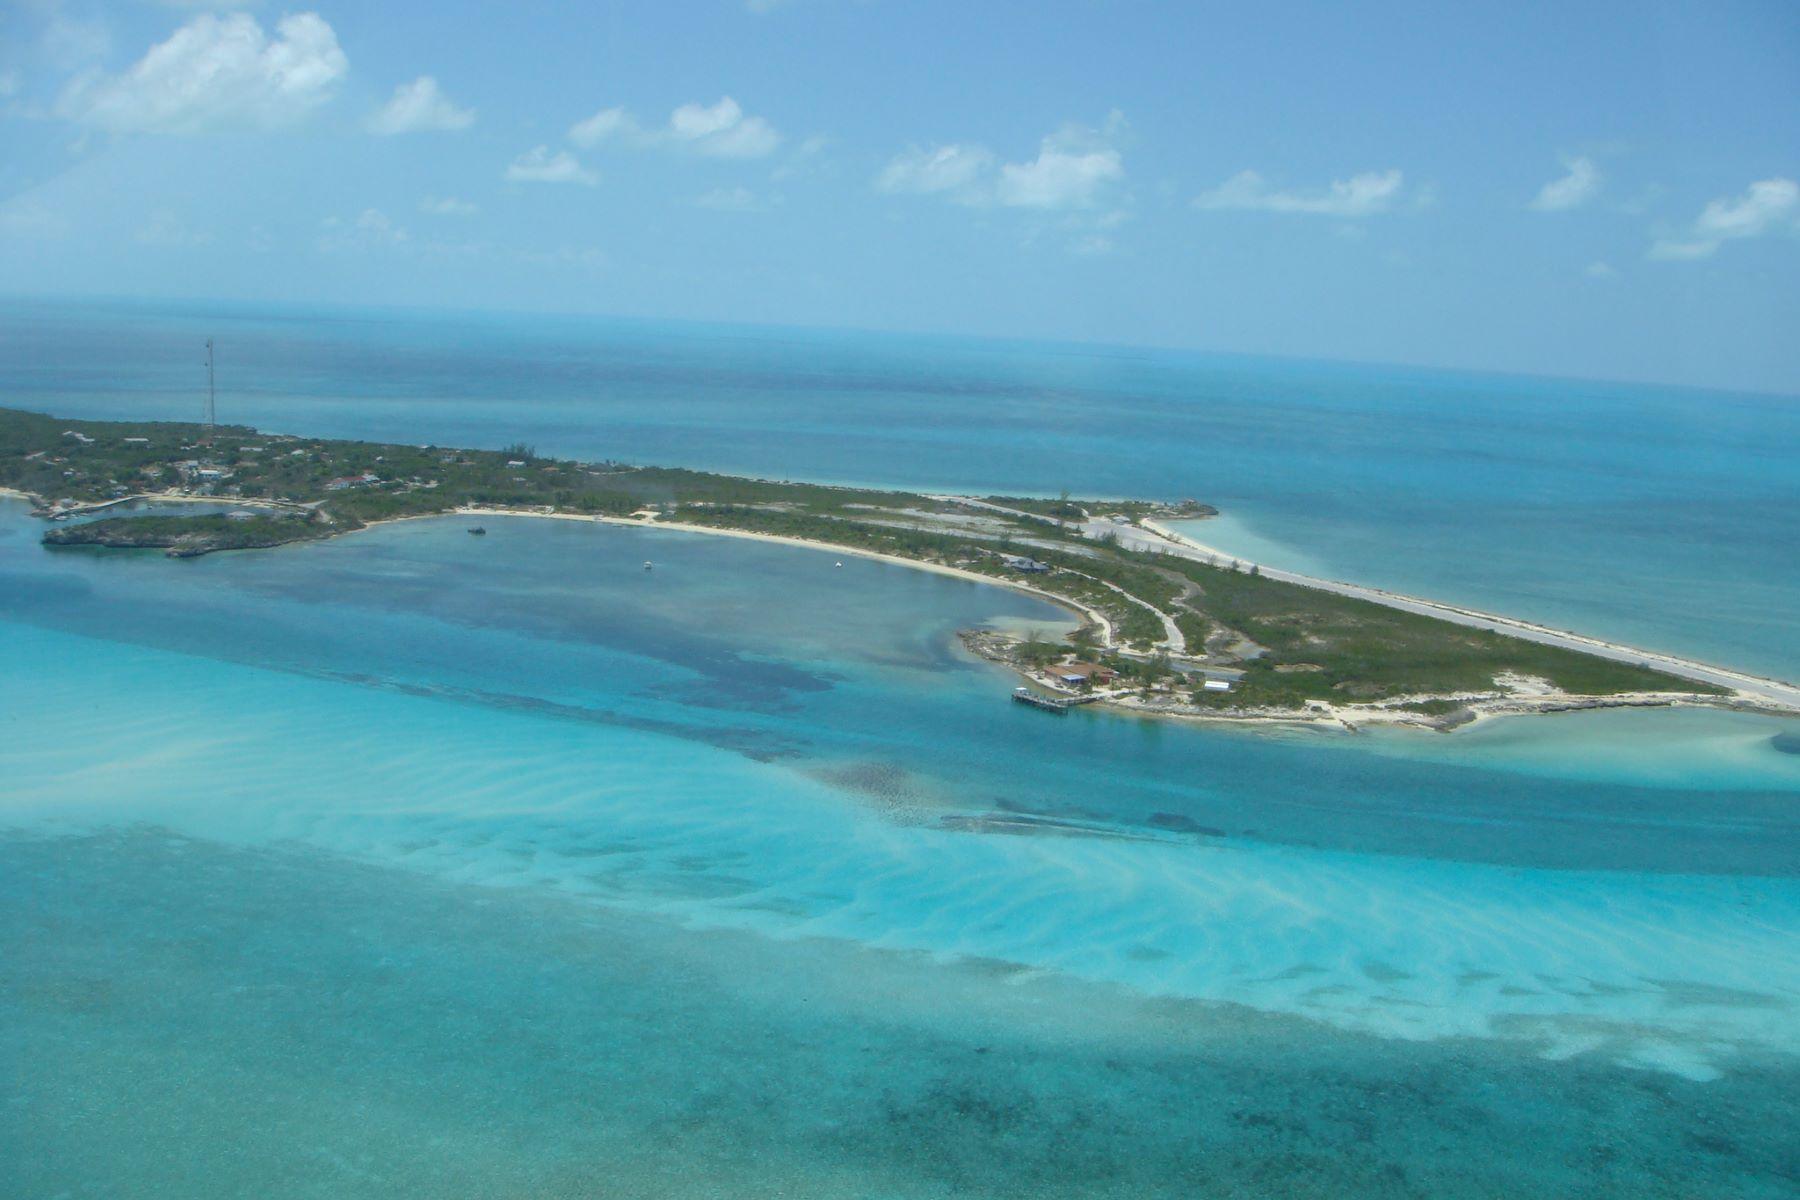 Property για την Πώληση στο Big Farmer's Cay, Exuma Cays Exuma Cays, Εξουμα Μπαχάμες